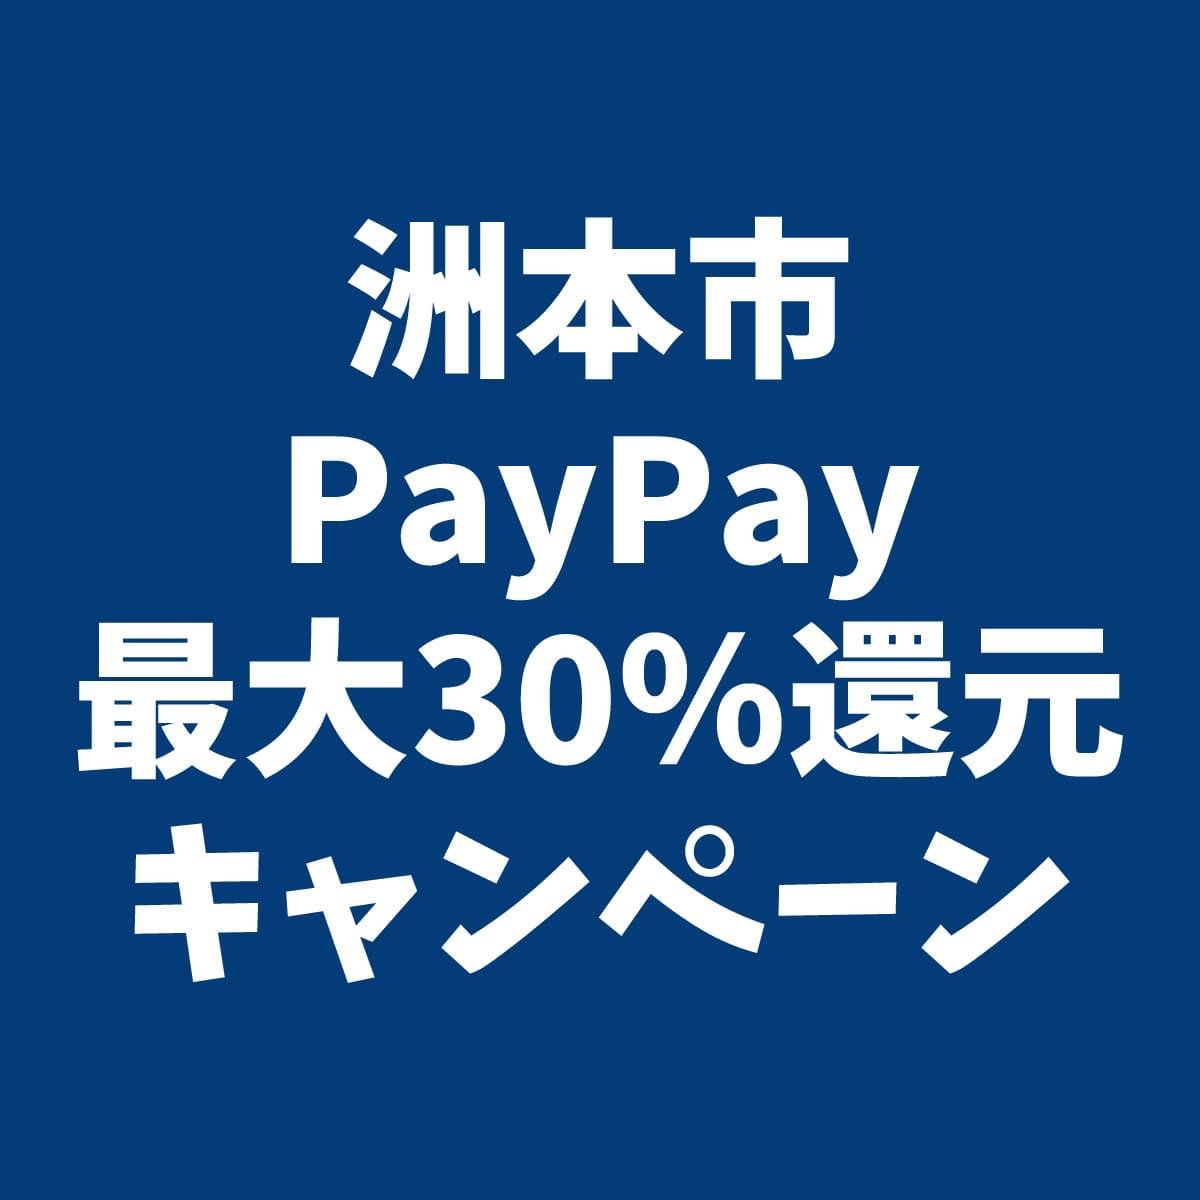 PayPay(ペイペイ)最大30%還元キャンペーン 洲本市